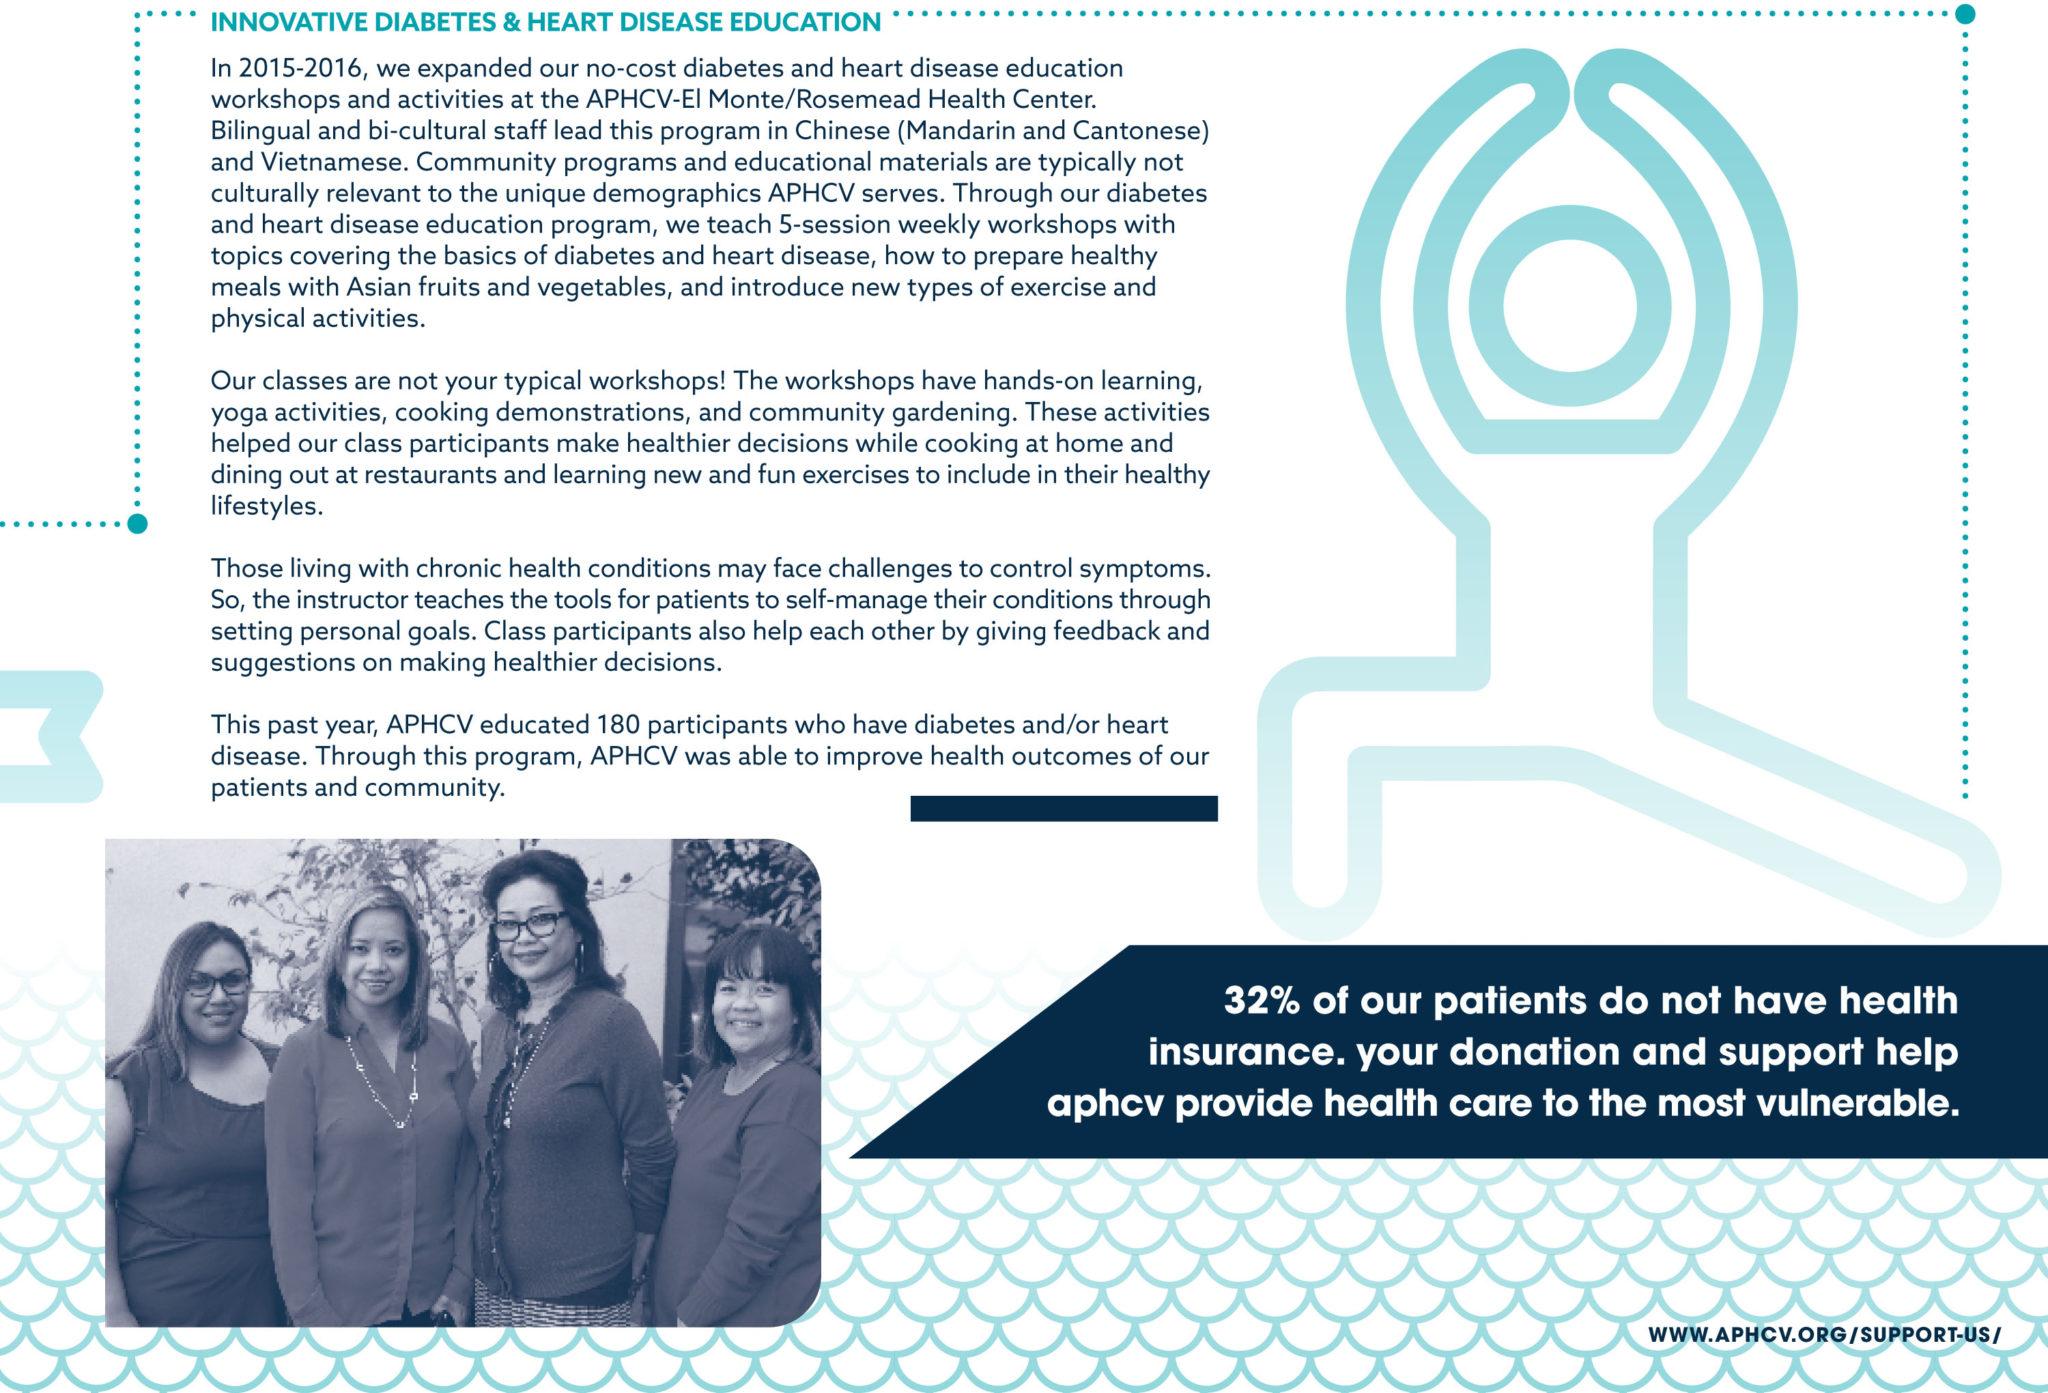 APHCV Annual Report Page 5